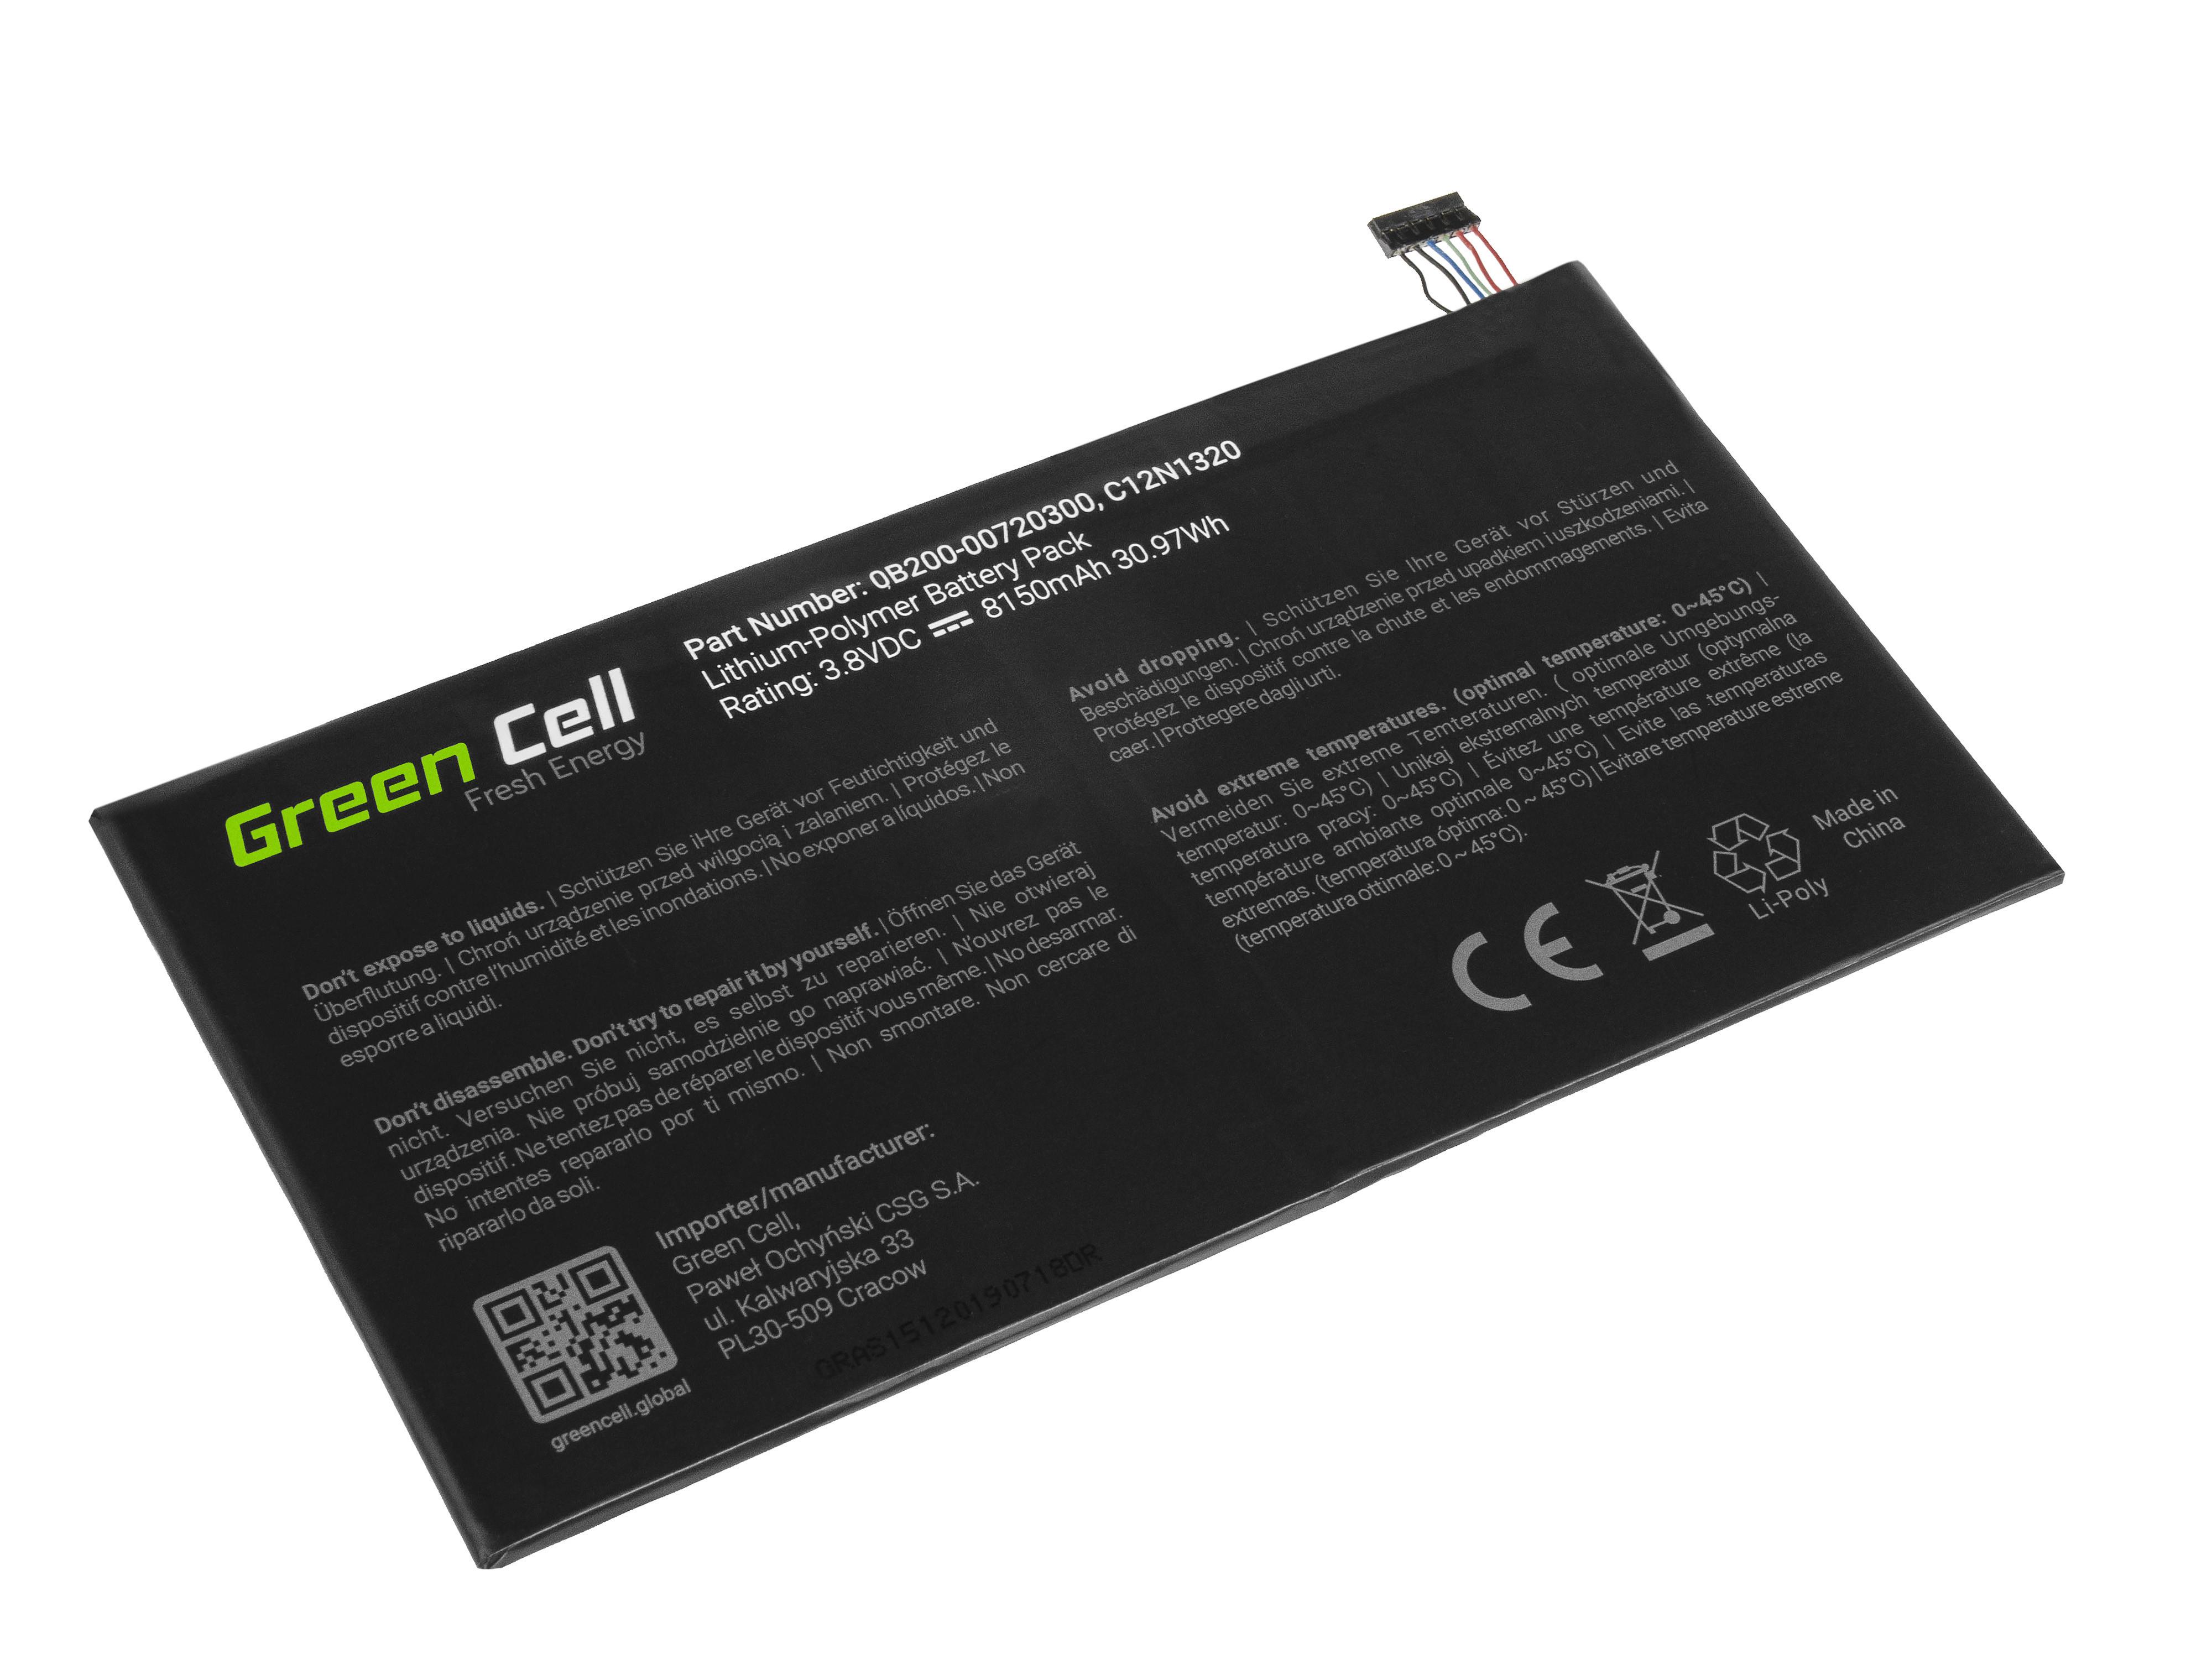 Green Cell AS151 Baterie Asus C12N1320 pro Asus Transformer Book T100T T100TA T100TAF T100TAM 8150mAh Li-Pol – neoriginální